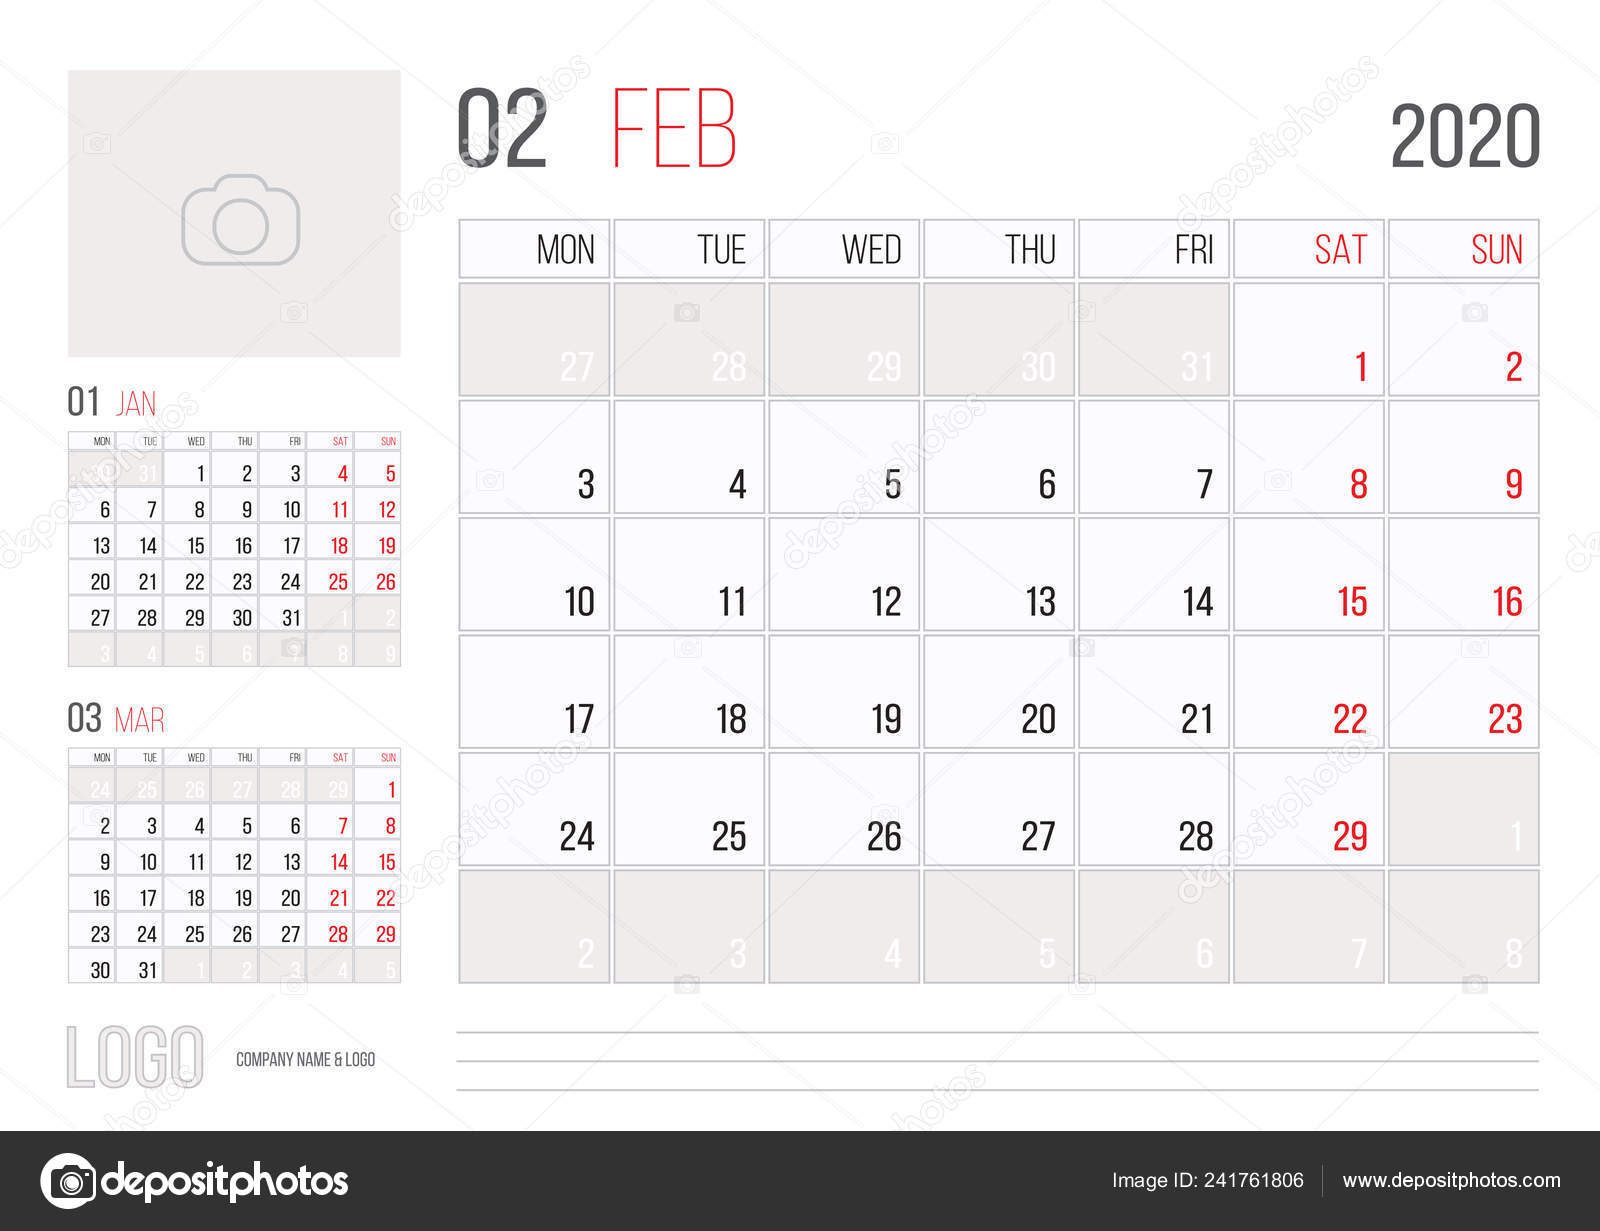 Febrero 2020 Calendario.Diseno Plantilla Corporativa Planner 2020 Calendario Mes Febrero